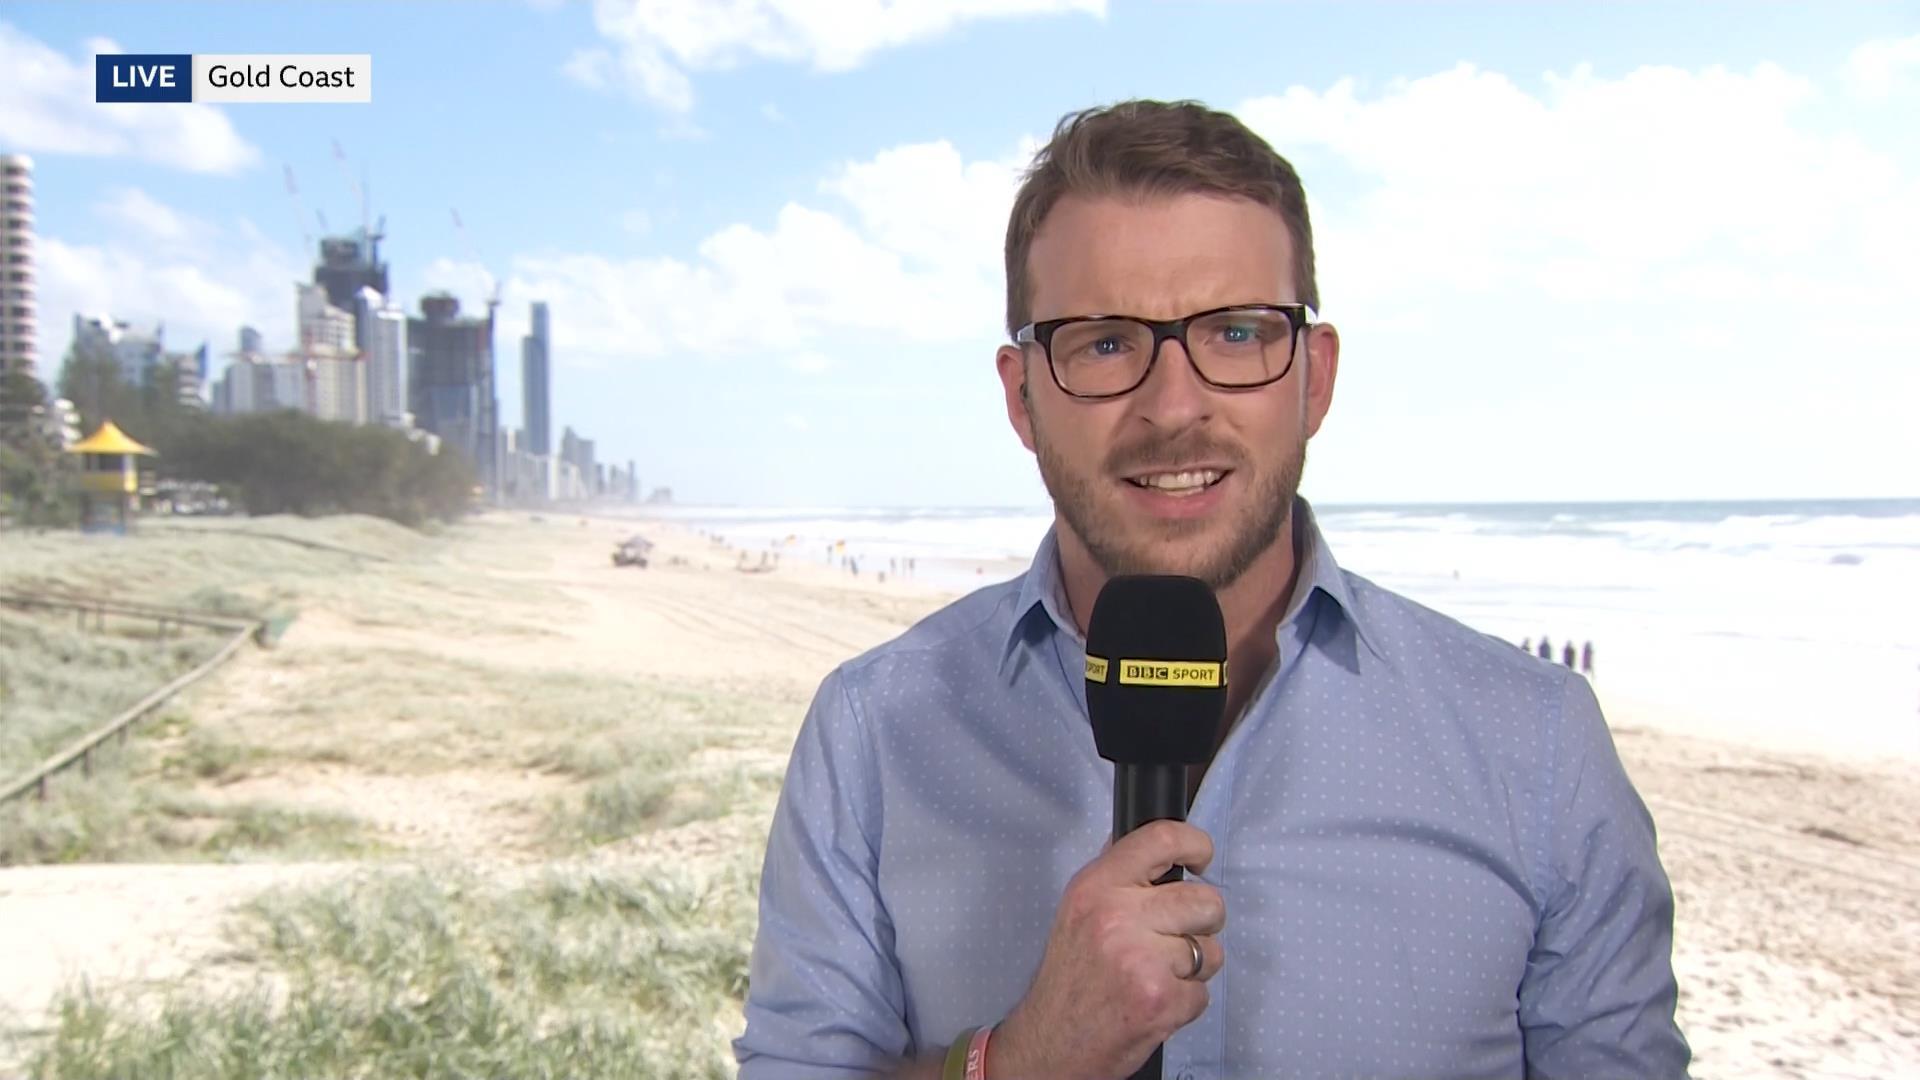 John-James JJ Chalmers - BBC Sport Presenter - Commonwealth Games 2018 (2)